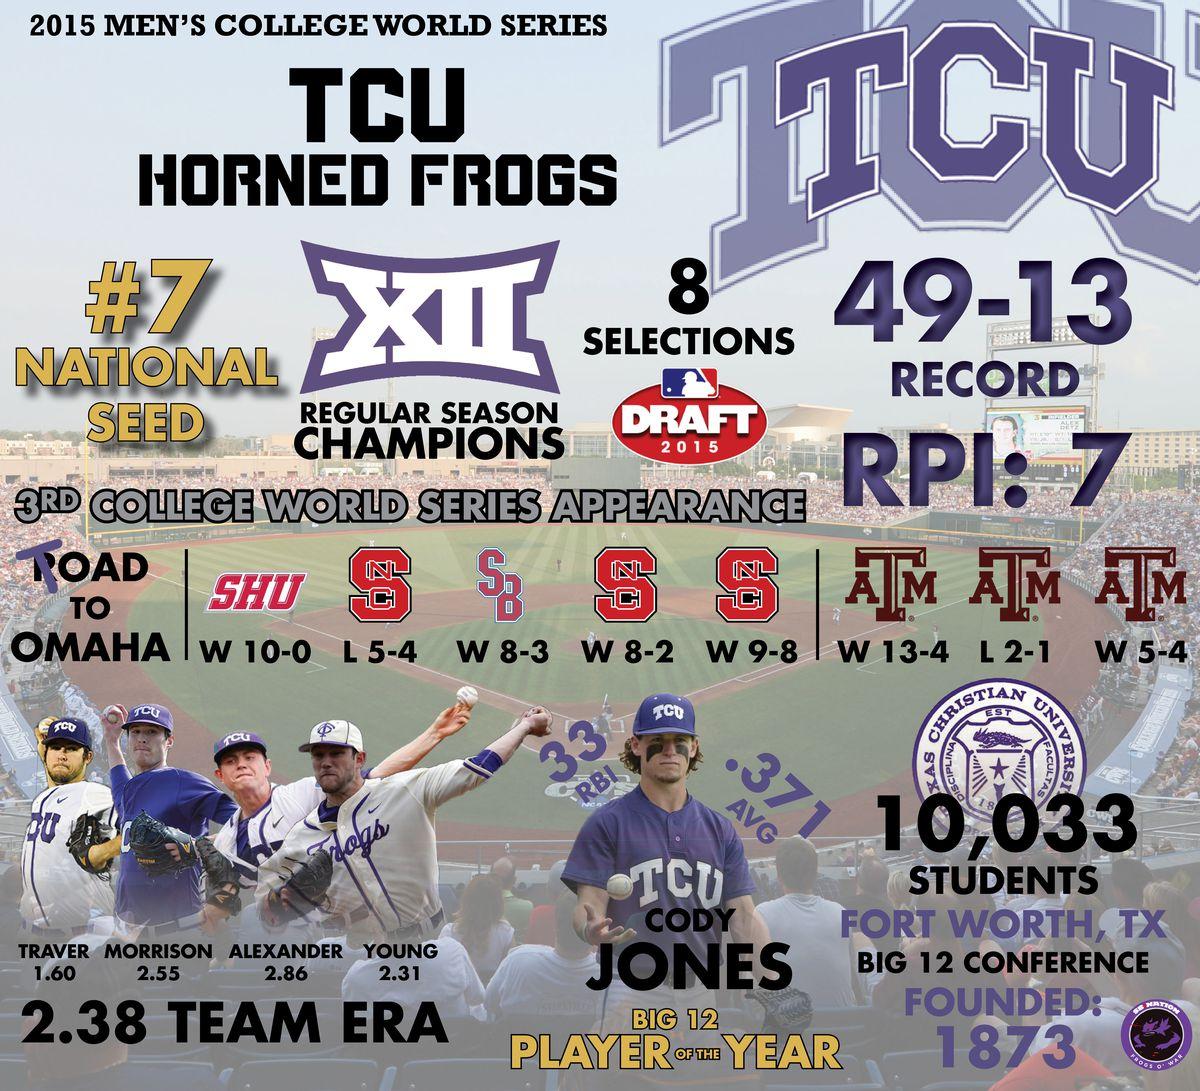 TCU Infographic